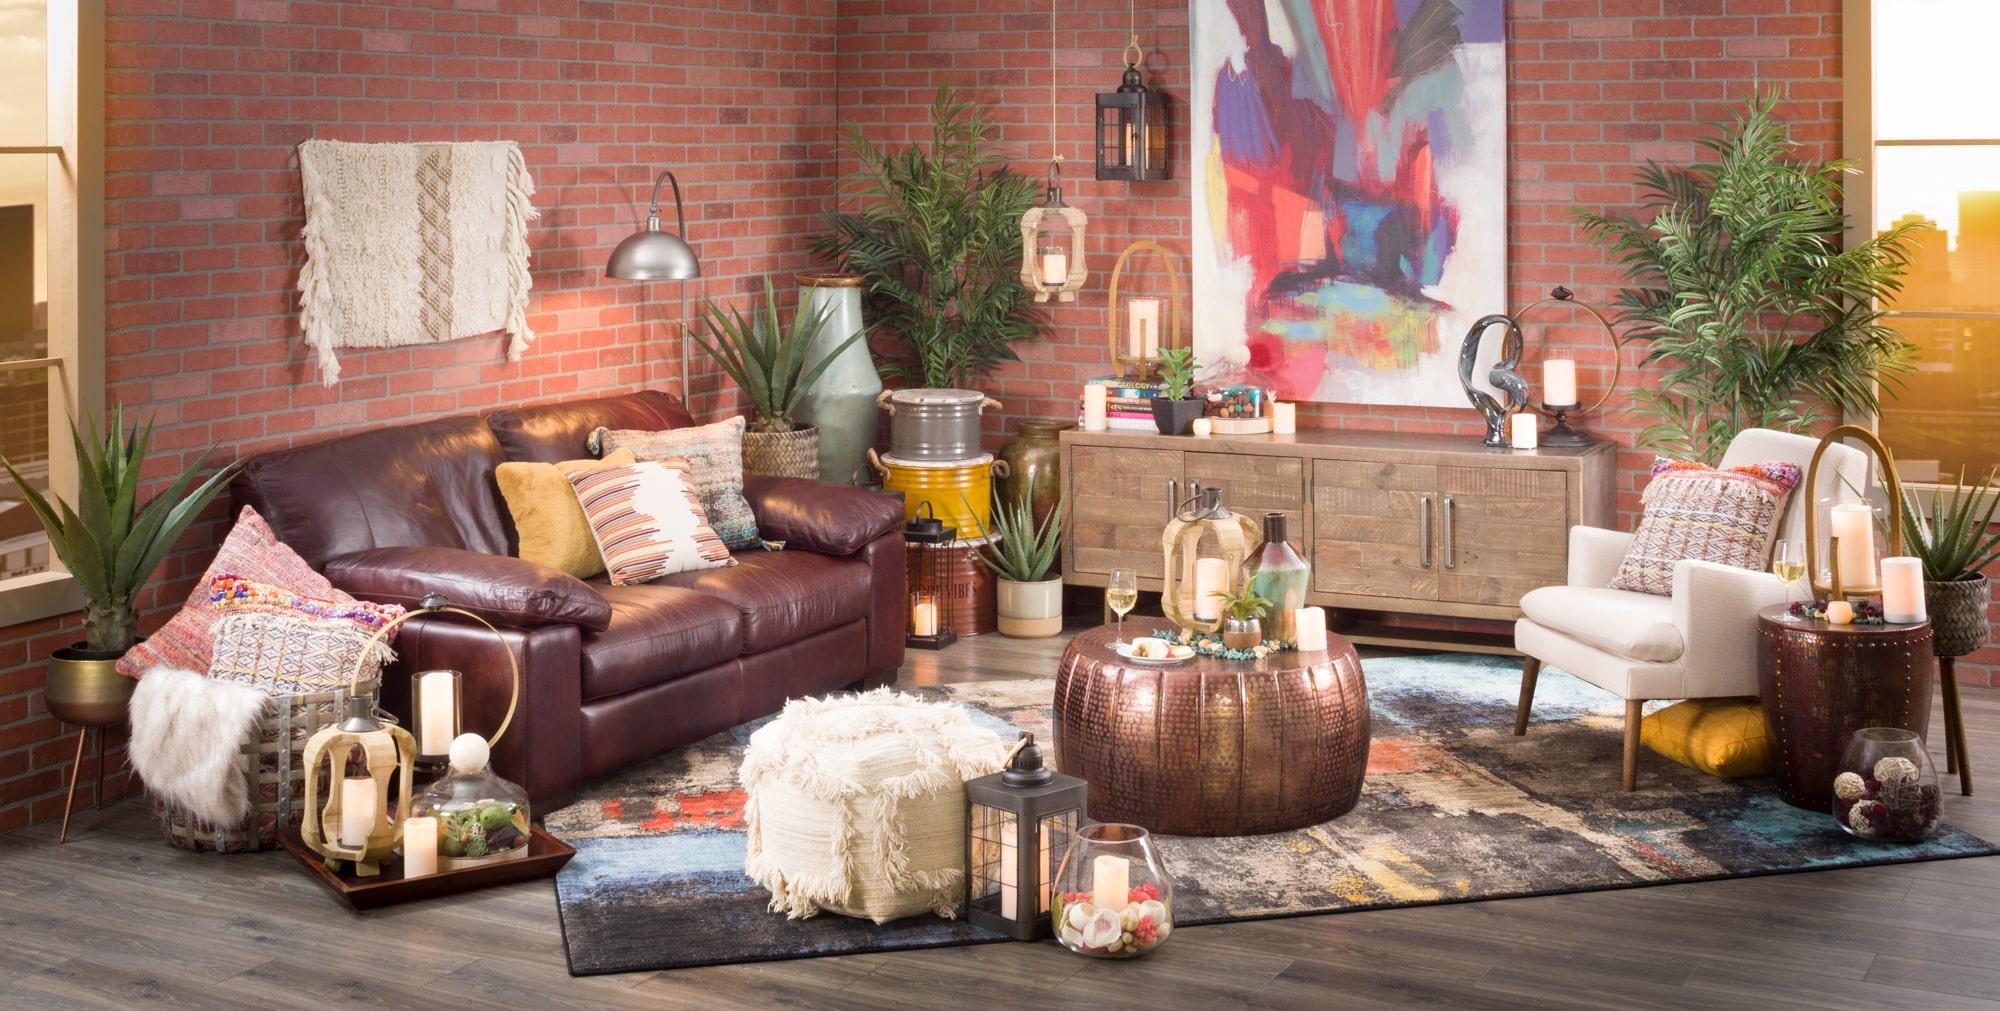 Boho living room with rug